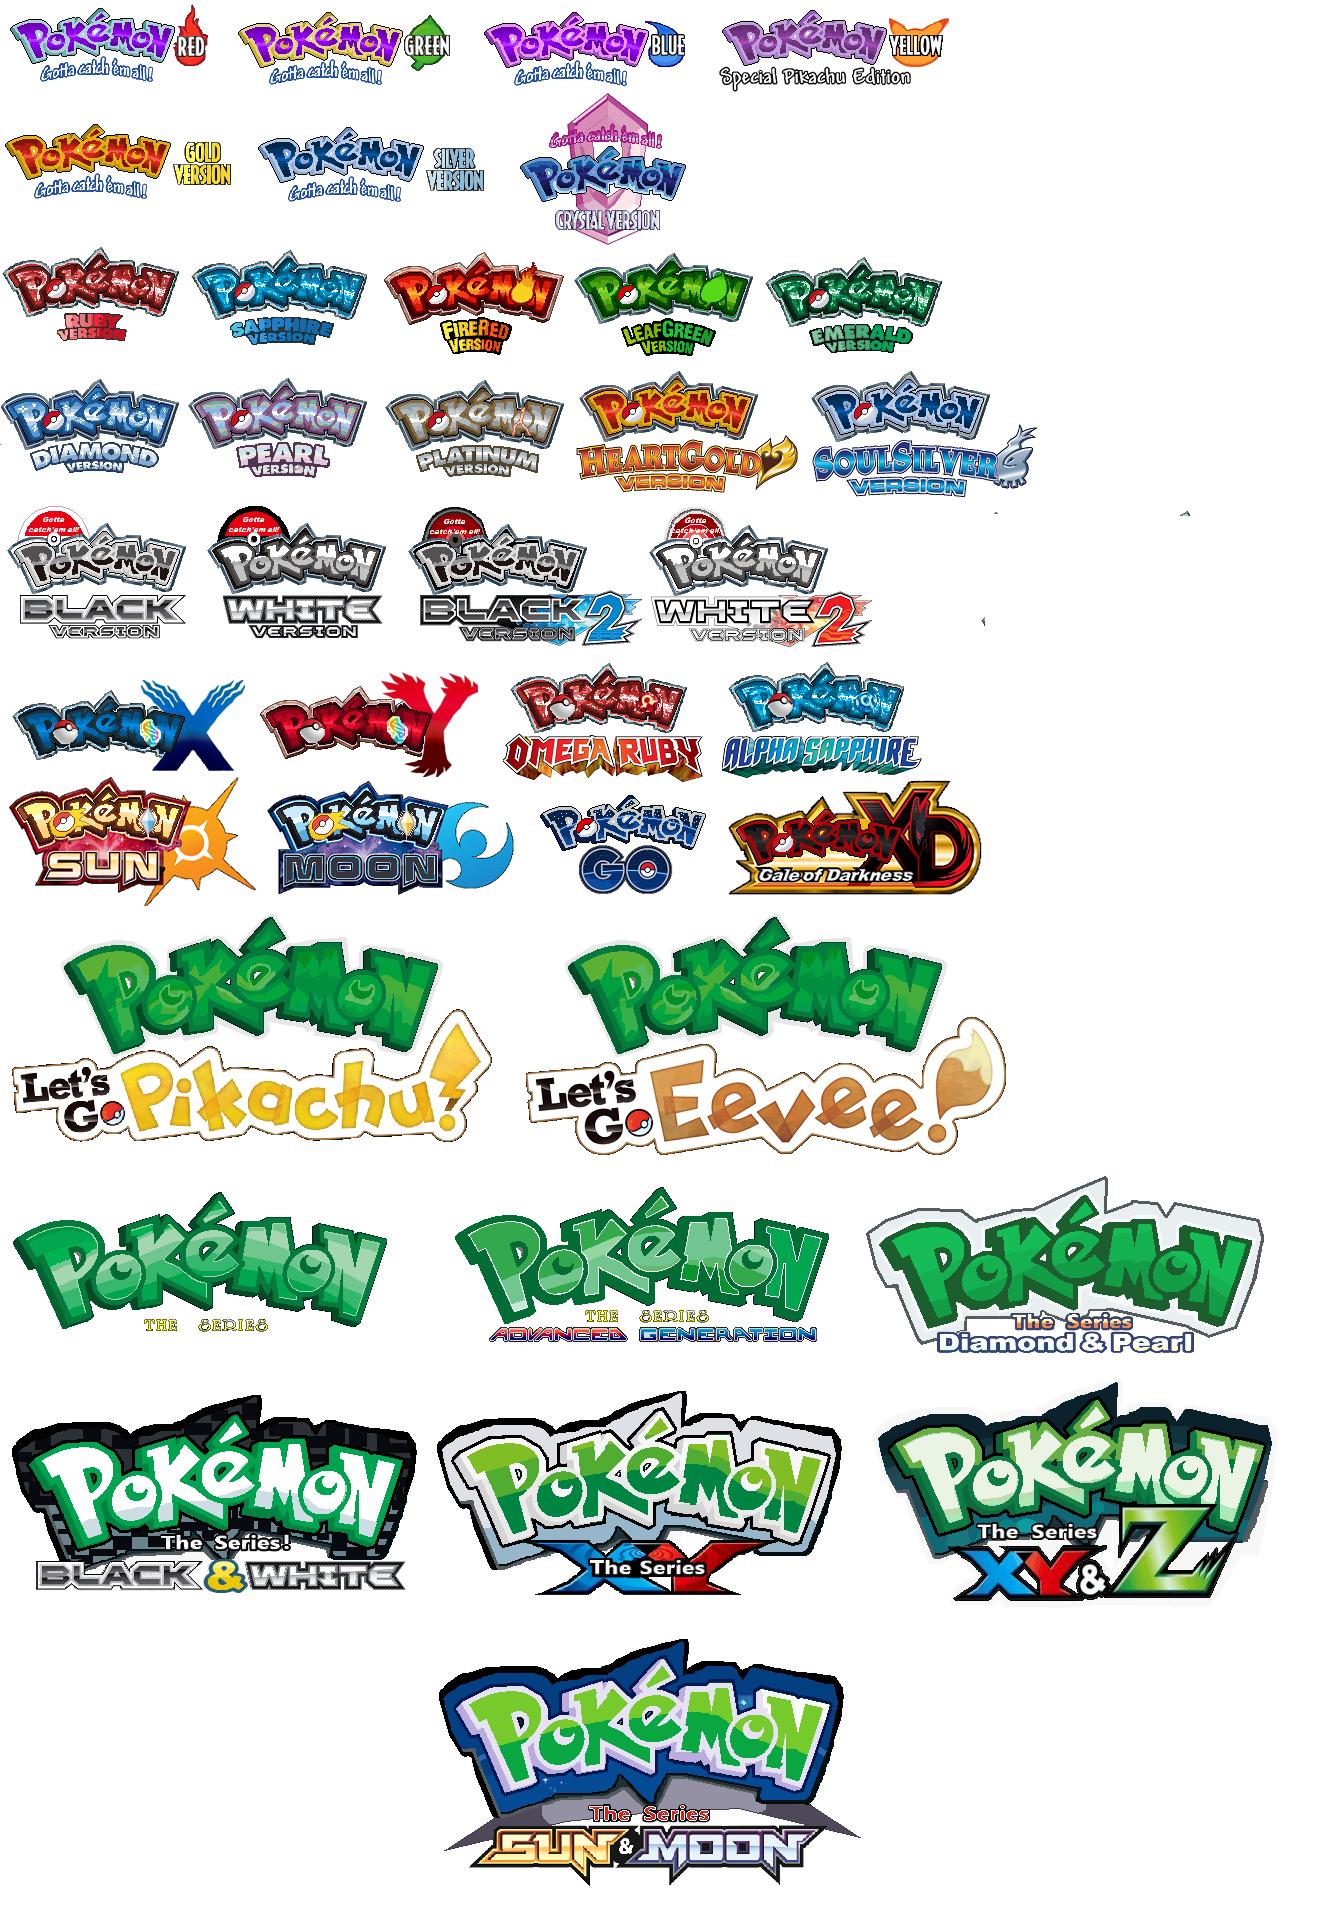 Pokemon Game Anime Logo Edits Closer To Original Japanese Versions Gen 1 7 Eevee Pokemon Games Pokemon